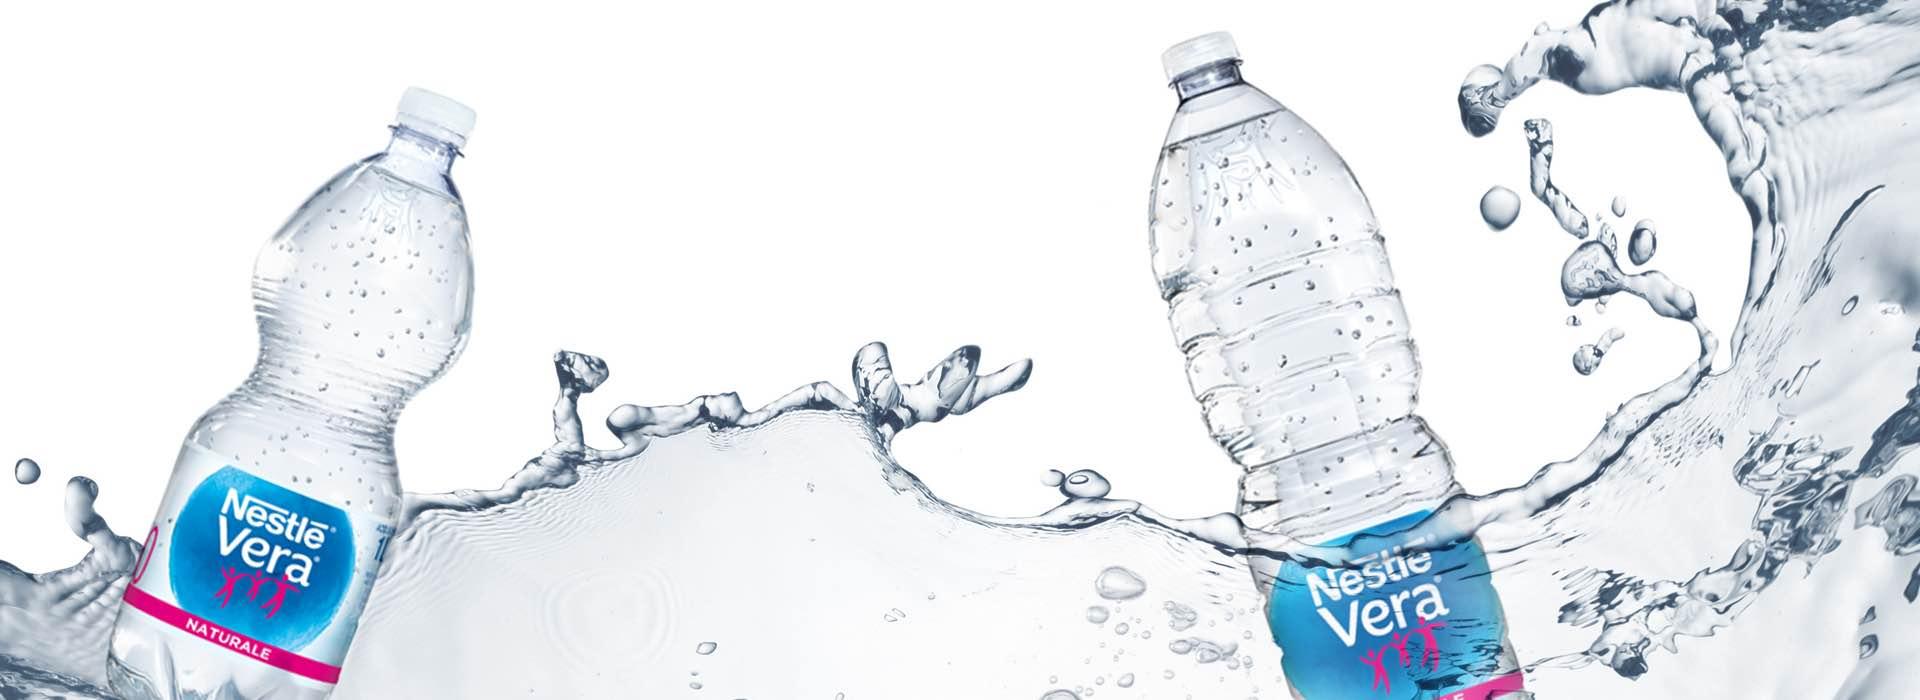 repackaging etichette bottiglie acqua Nestlé Vera